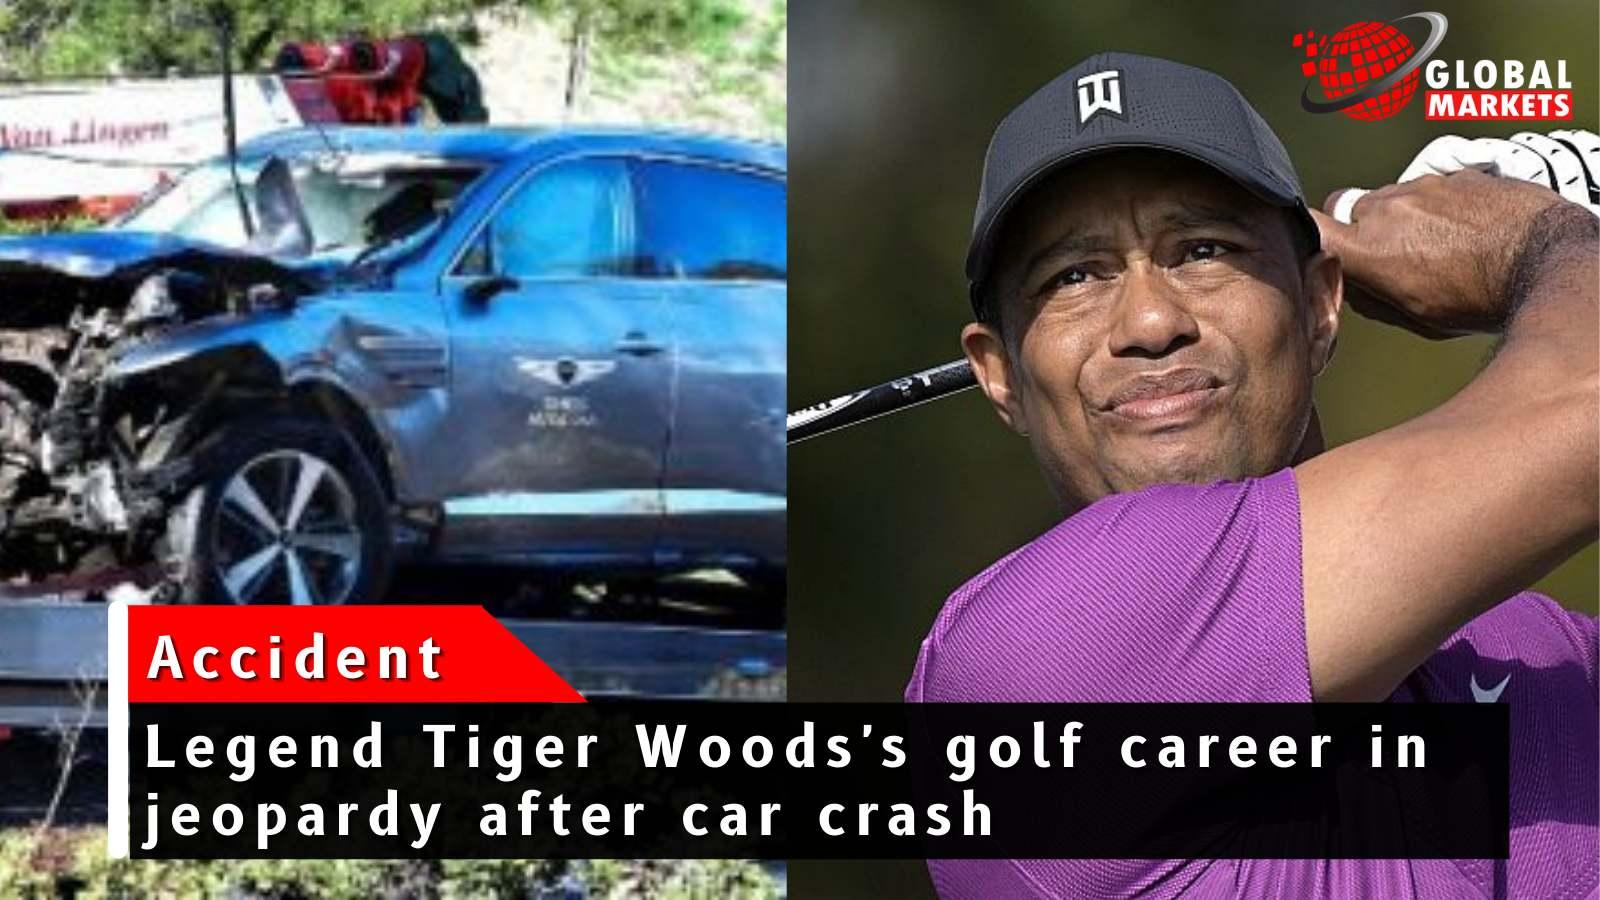 The Legendary Golf Star Tiger woods suffers leg injury in Jeopardy car crash.